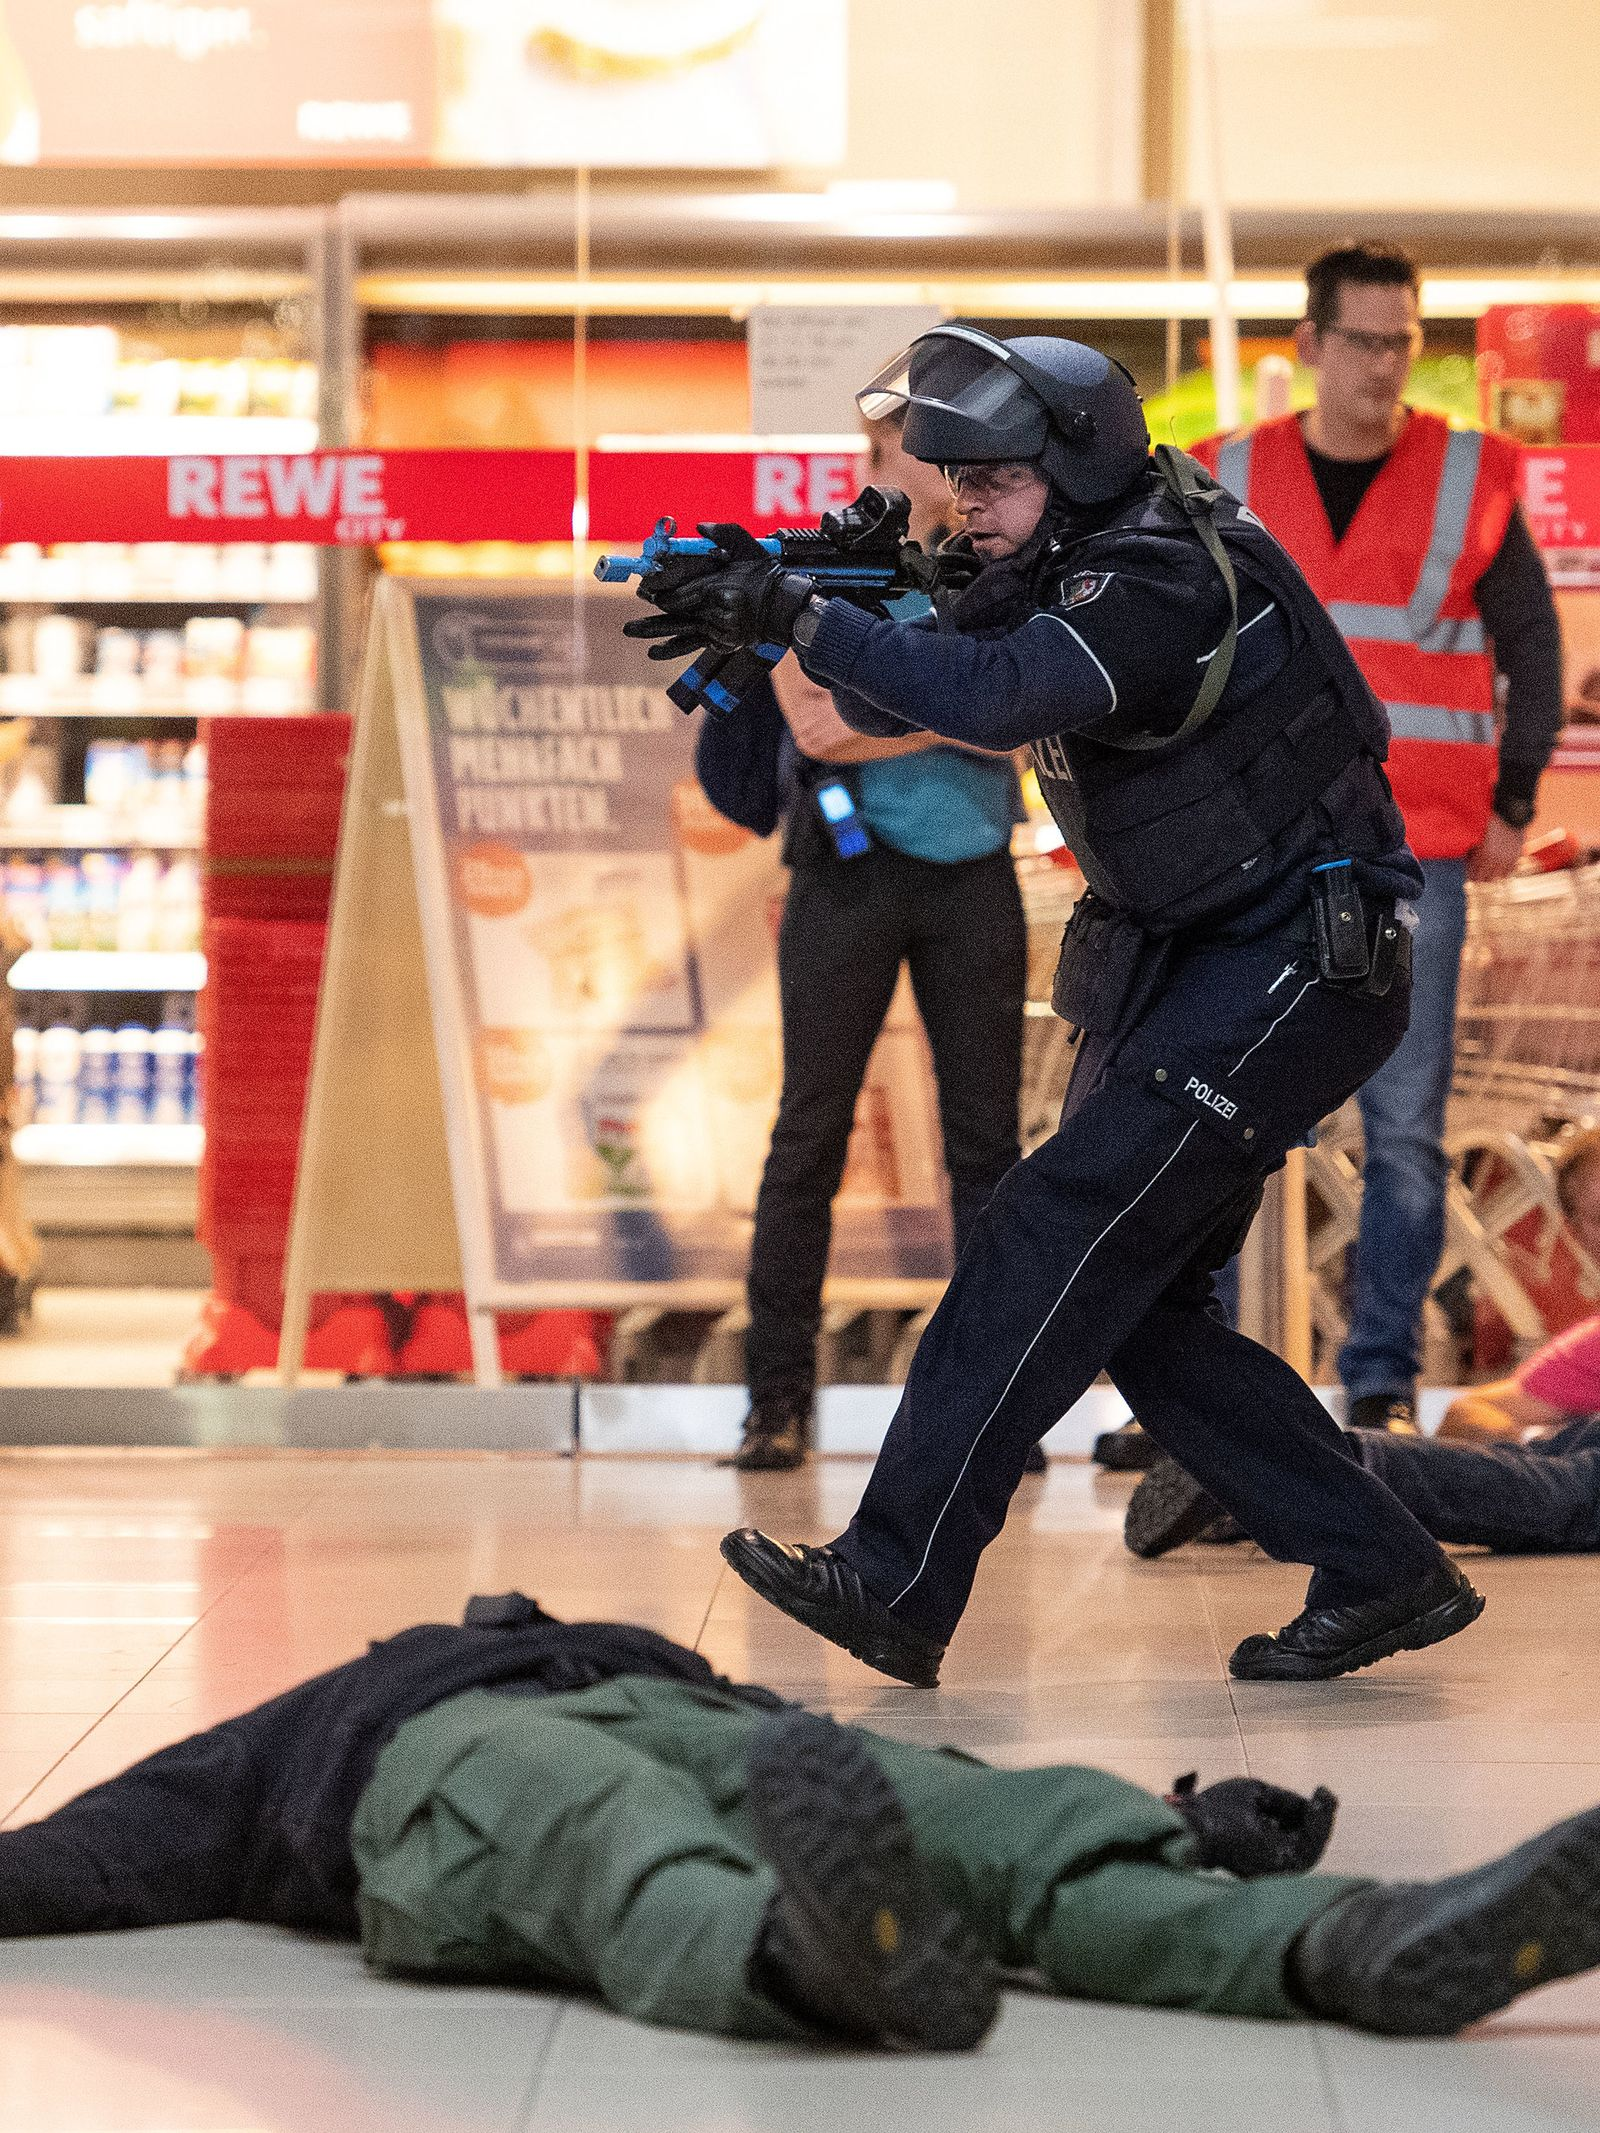 Anti-Terror-Übung am Flughafen Köln/Bonn